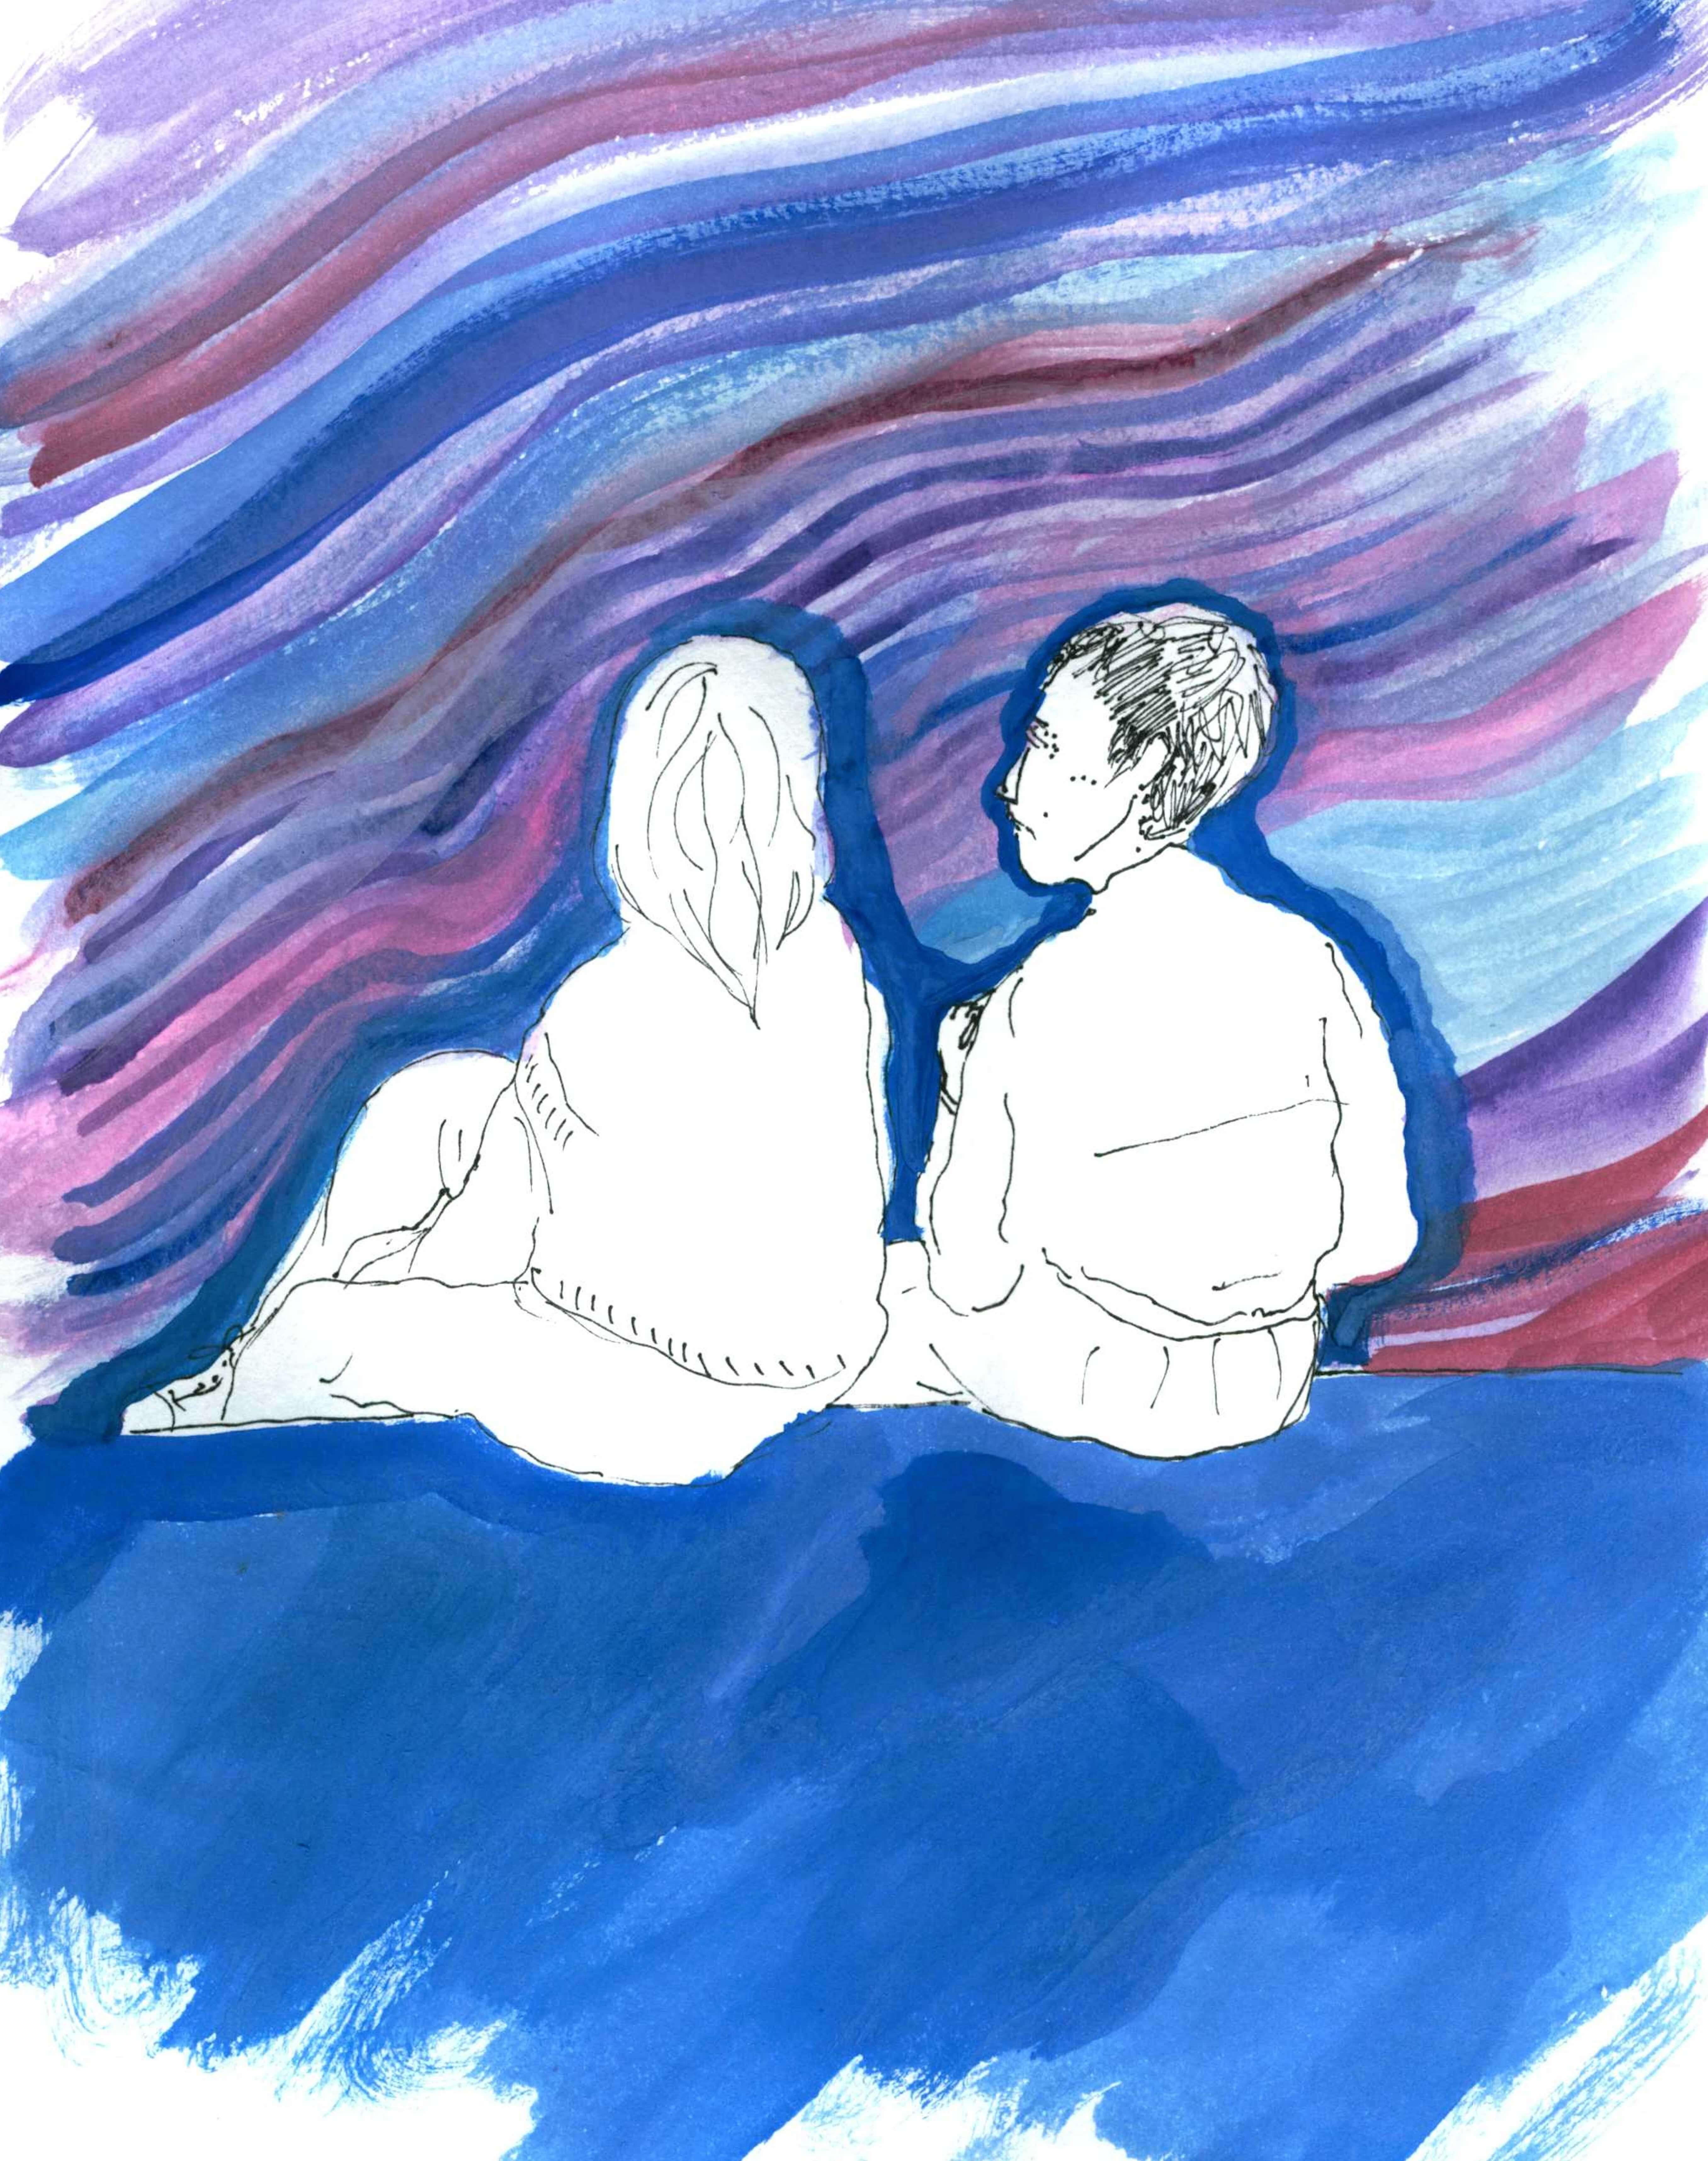 Illustration by Sunny.